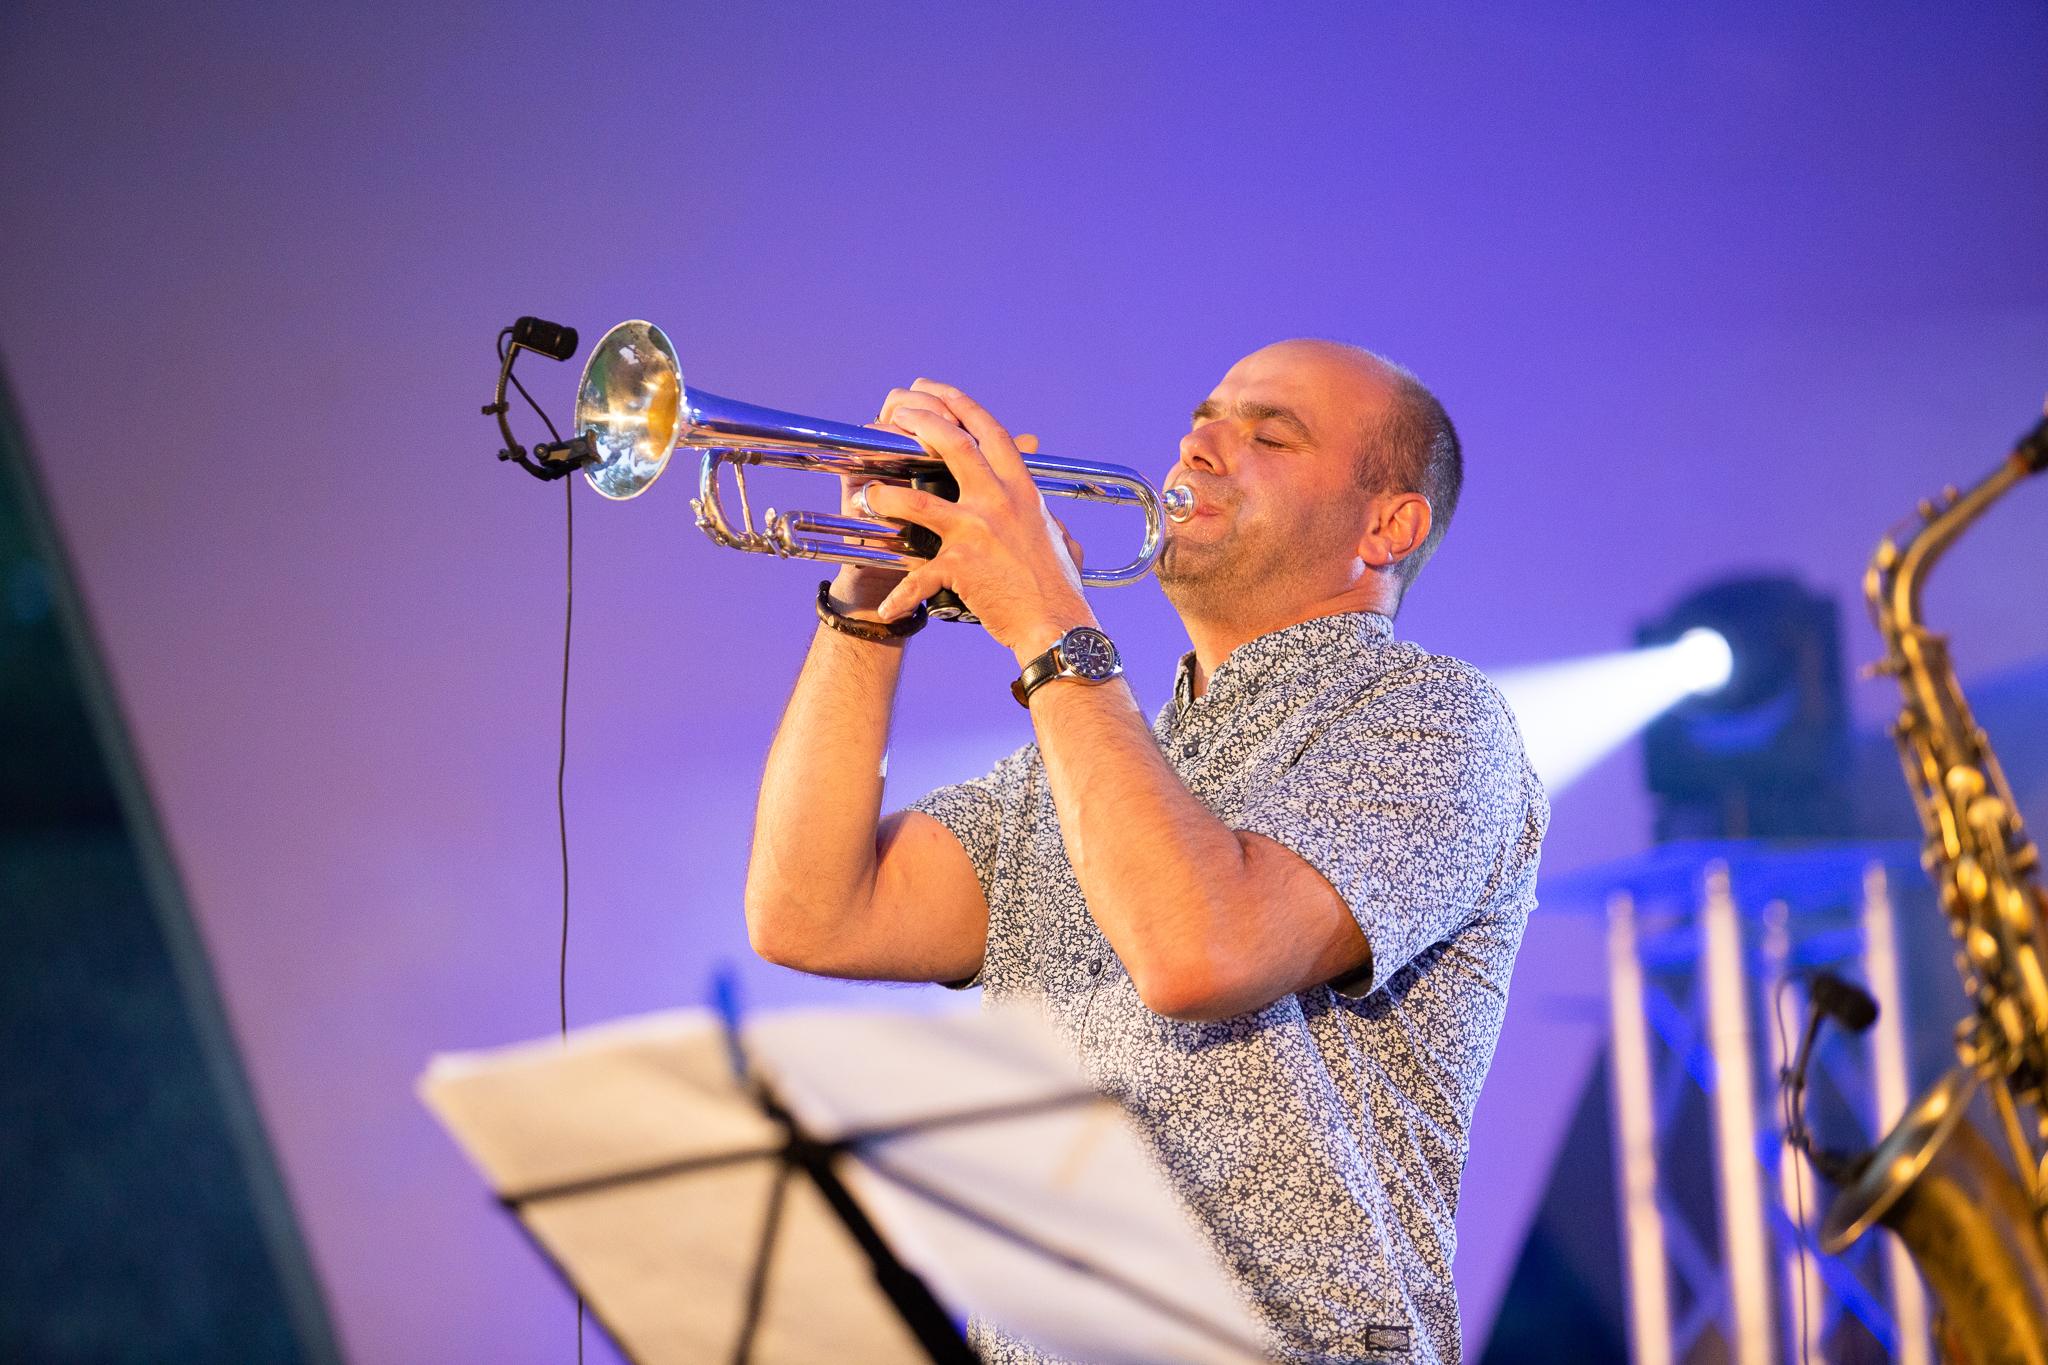 Photo report from the concert in Tarnów (2020). Sebastian Maciejko